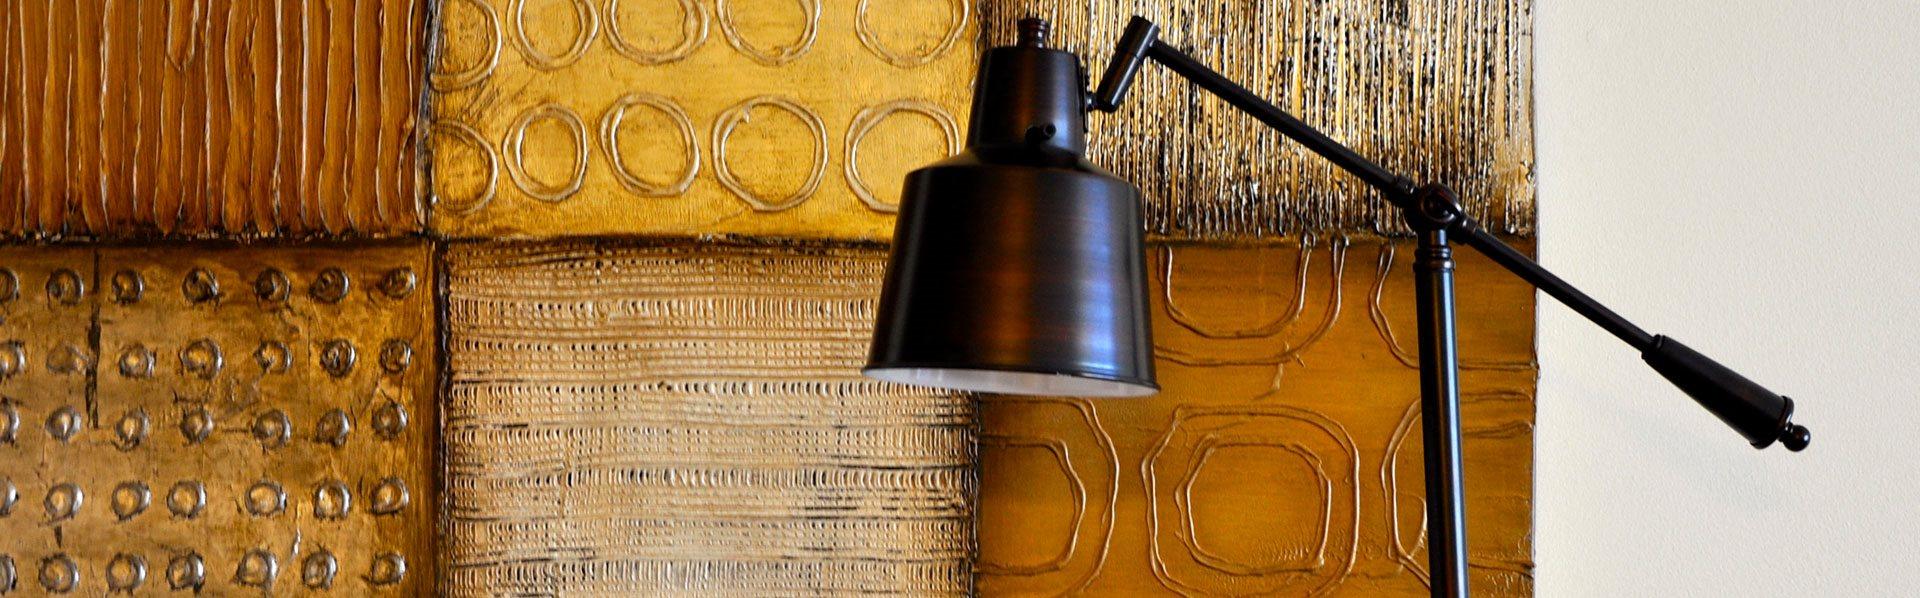 Modern light Fixtures and Textures at 7 Cameron, Massachusetts, 02140